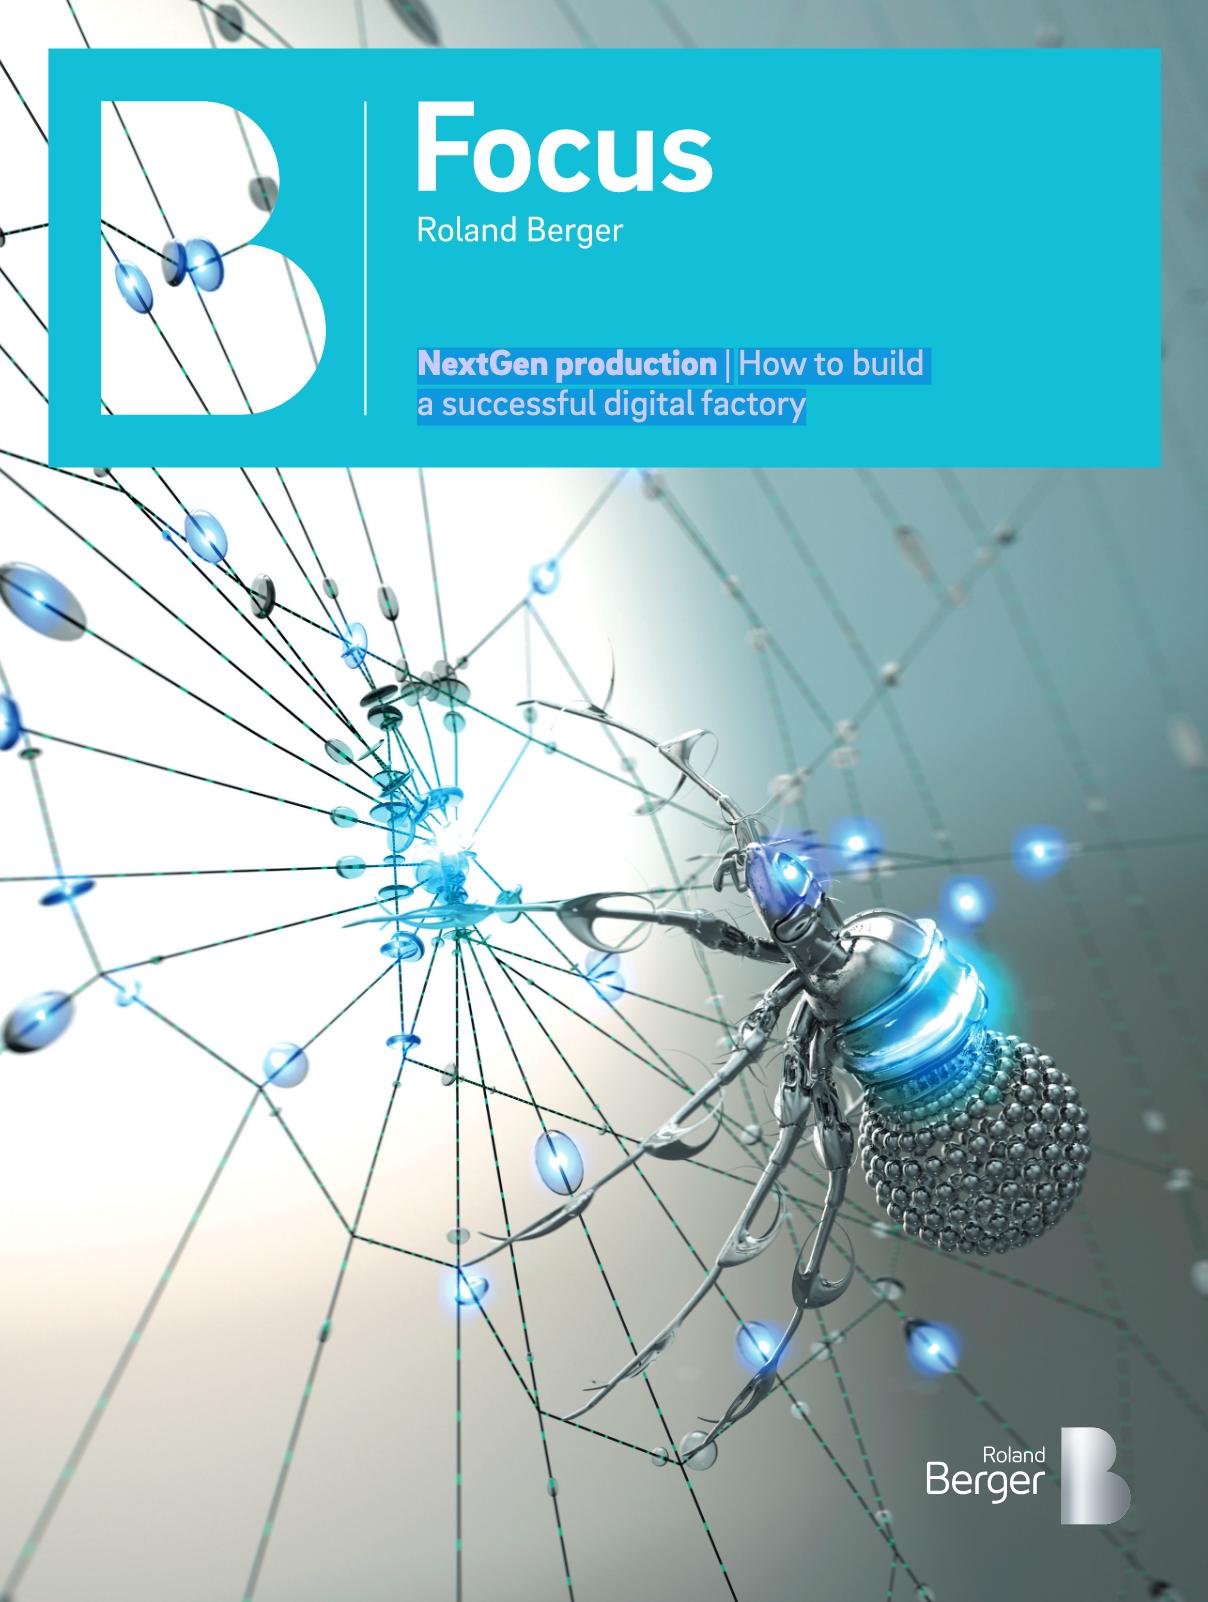 NextGen production |How to build a successful digital factory